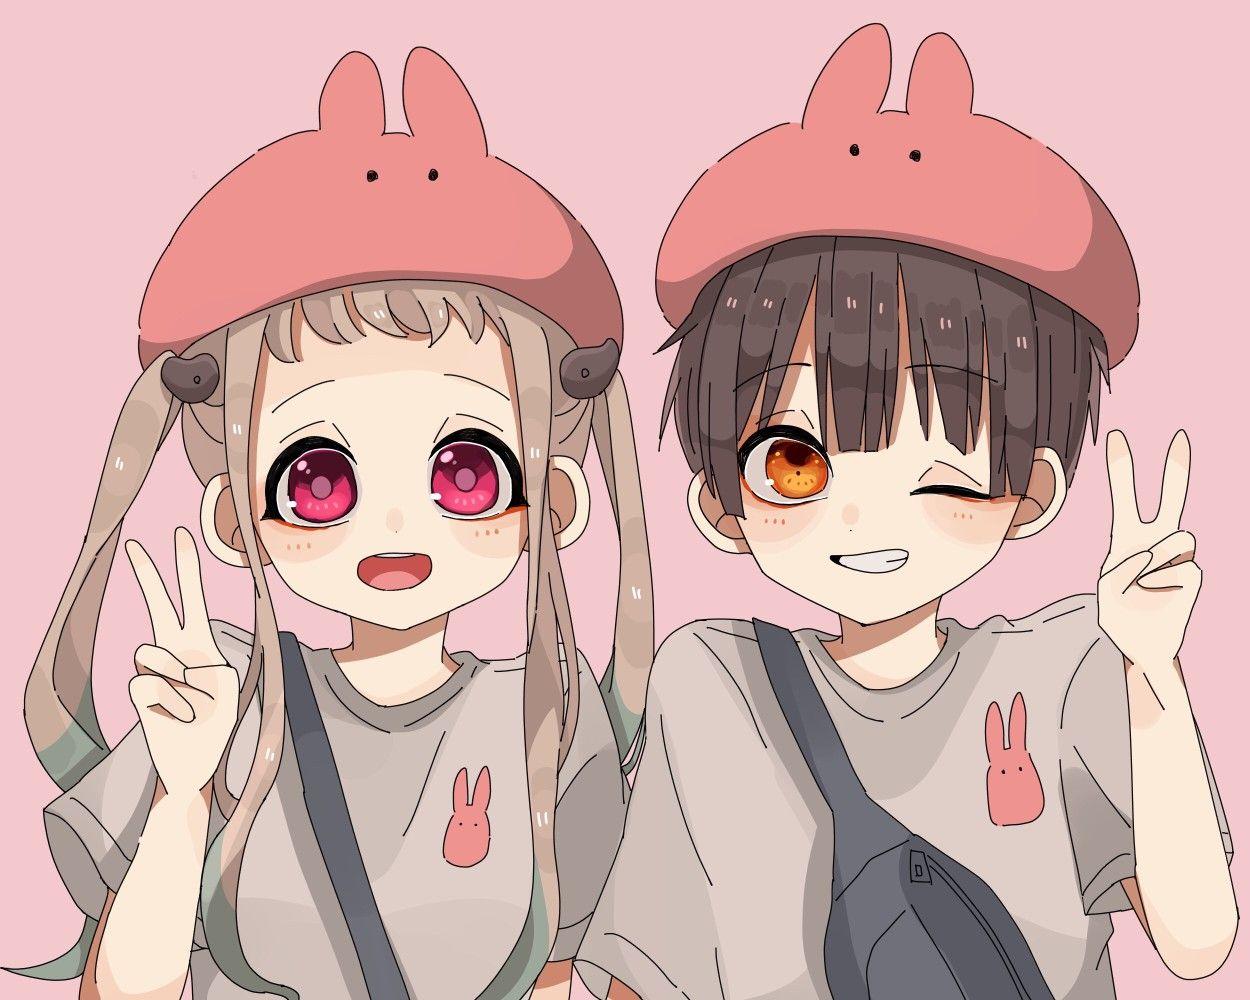 Sour leo belongs to thelovelykanna._kae. Hanako x Yashiro | Anime, Đang yêu, Dễ thương